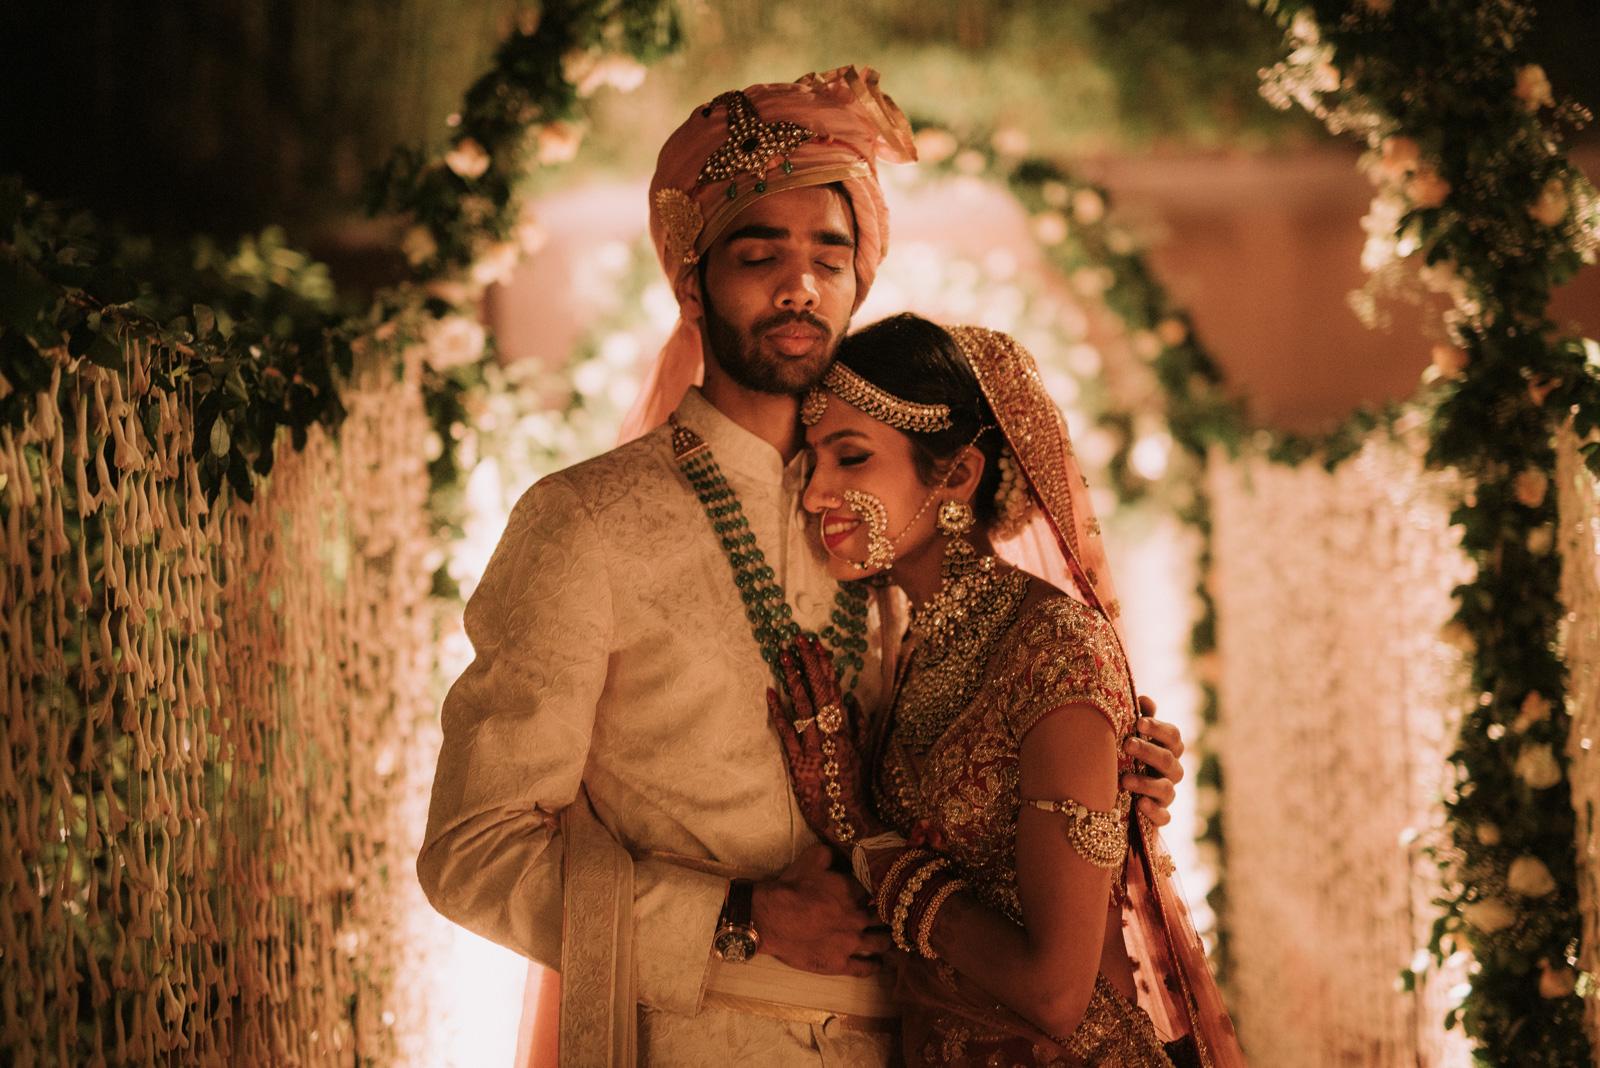 wedding in india - destination wedding photographer-3.jpg